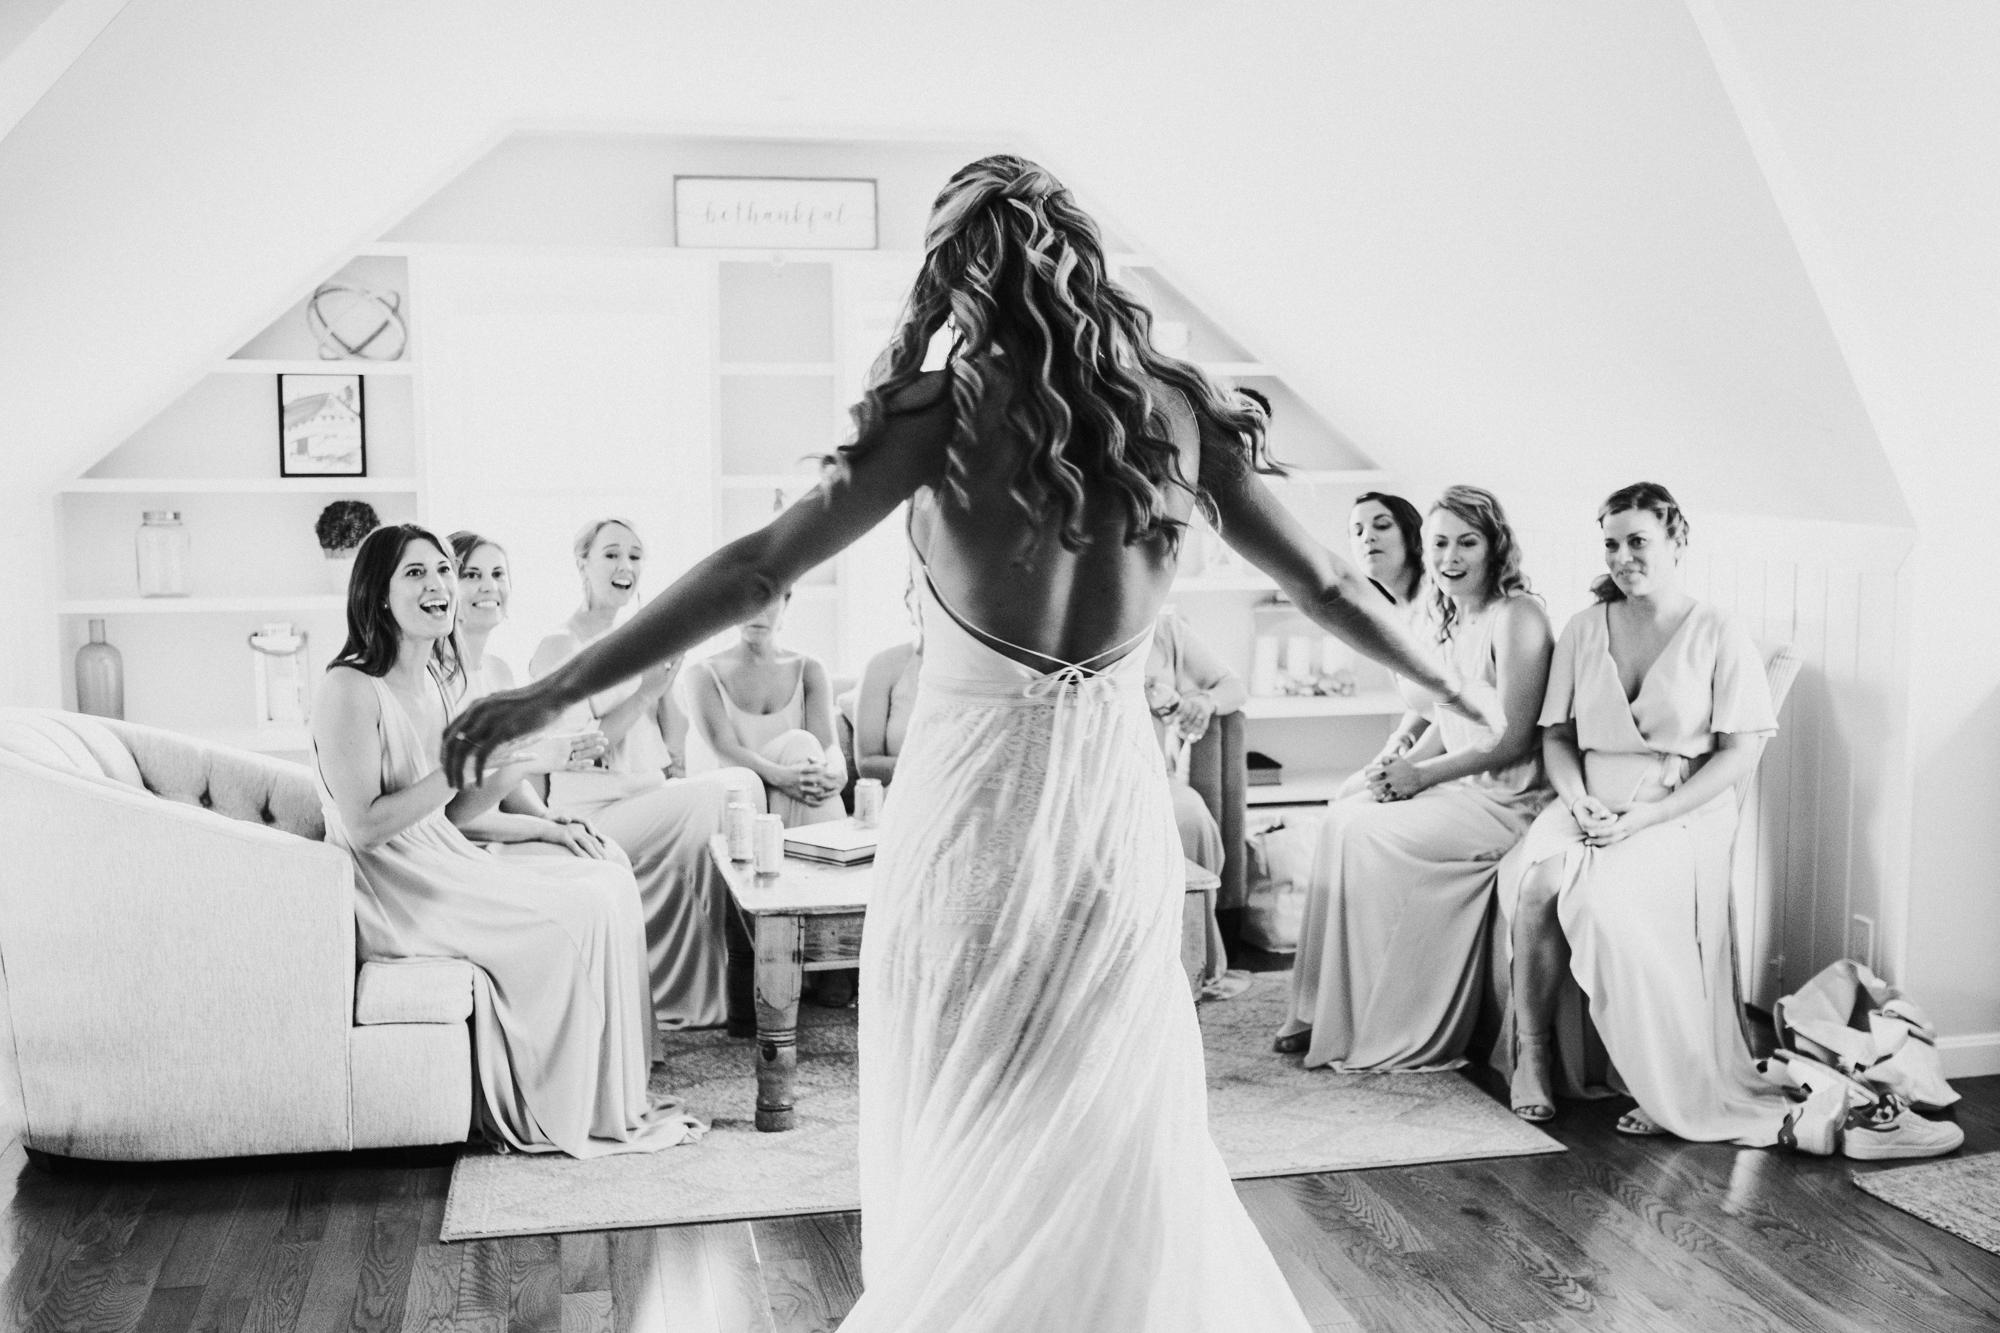 Wedding_Francis_Boucher_Jonathan_Edwards_Winery_2018-11.jpg